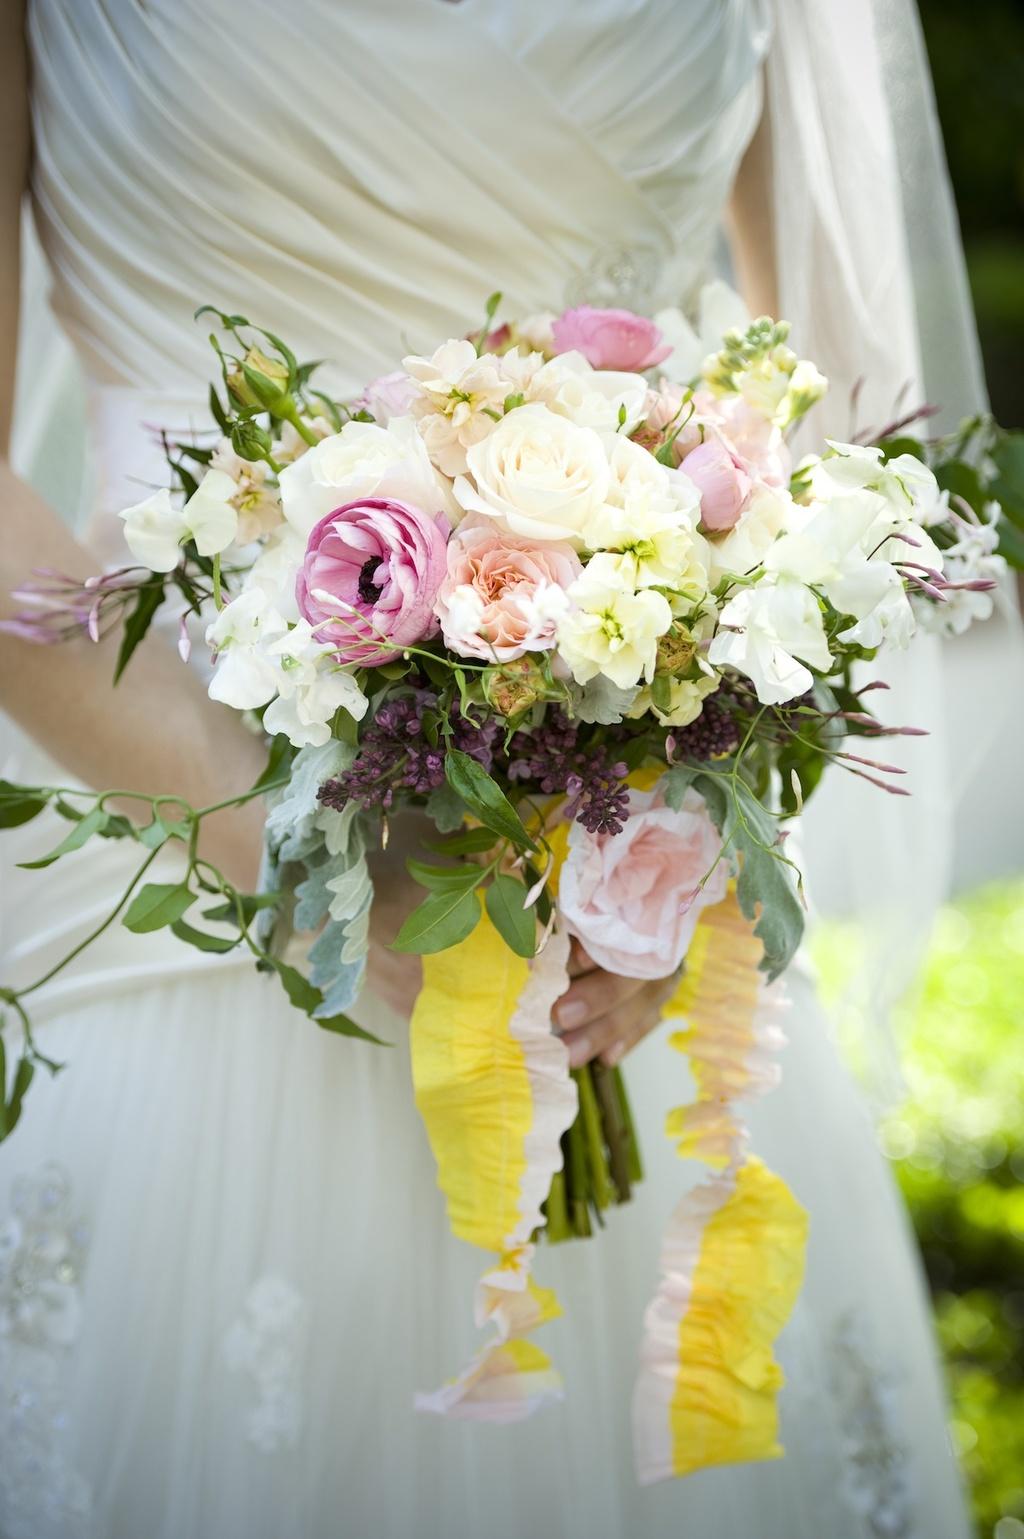 Whimsical-outdoor-wedding-garden-venue-romantic-bridal-bouquet.full